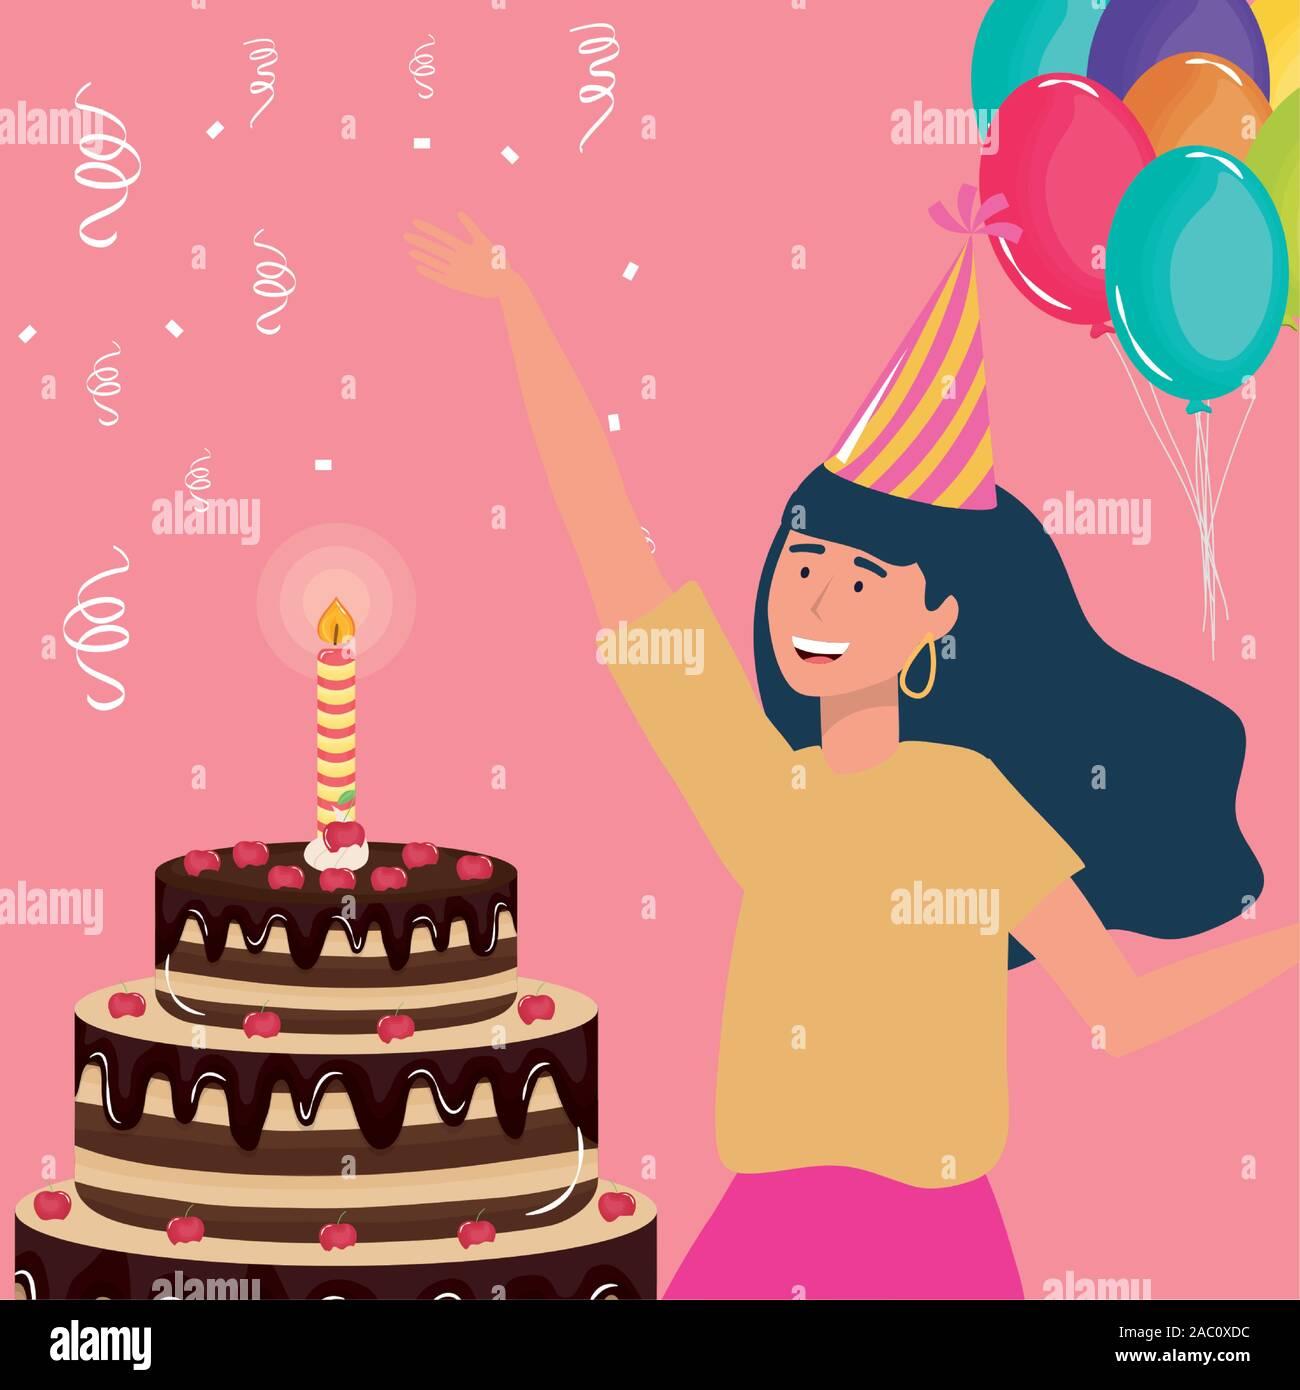 Astounding Happy Birthday Woman With Chocolate Cake And Balloons Celebration Personalised Birthday Cards Arneslily Jamesorg